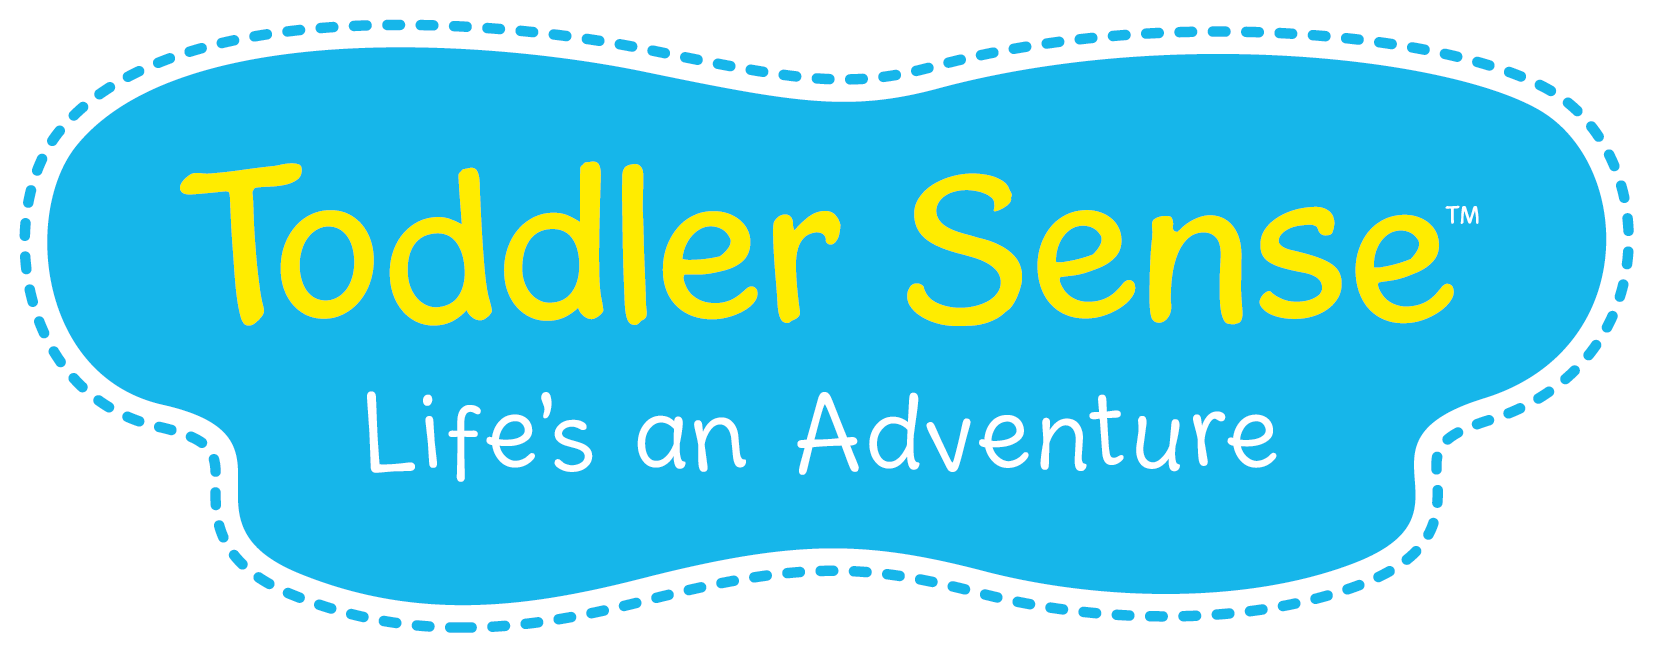 Toddler Sense Dundee's main image